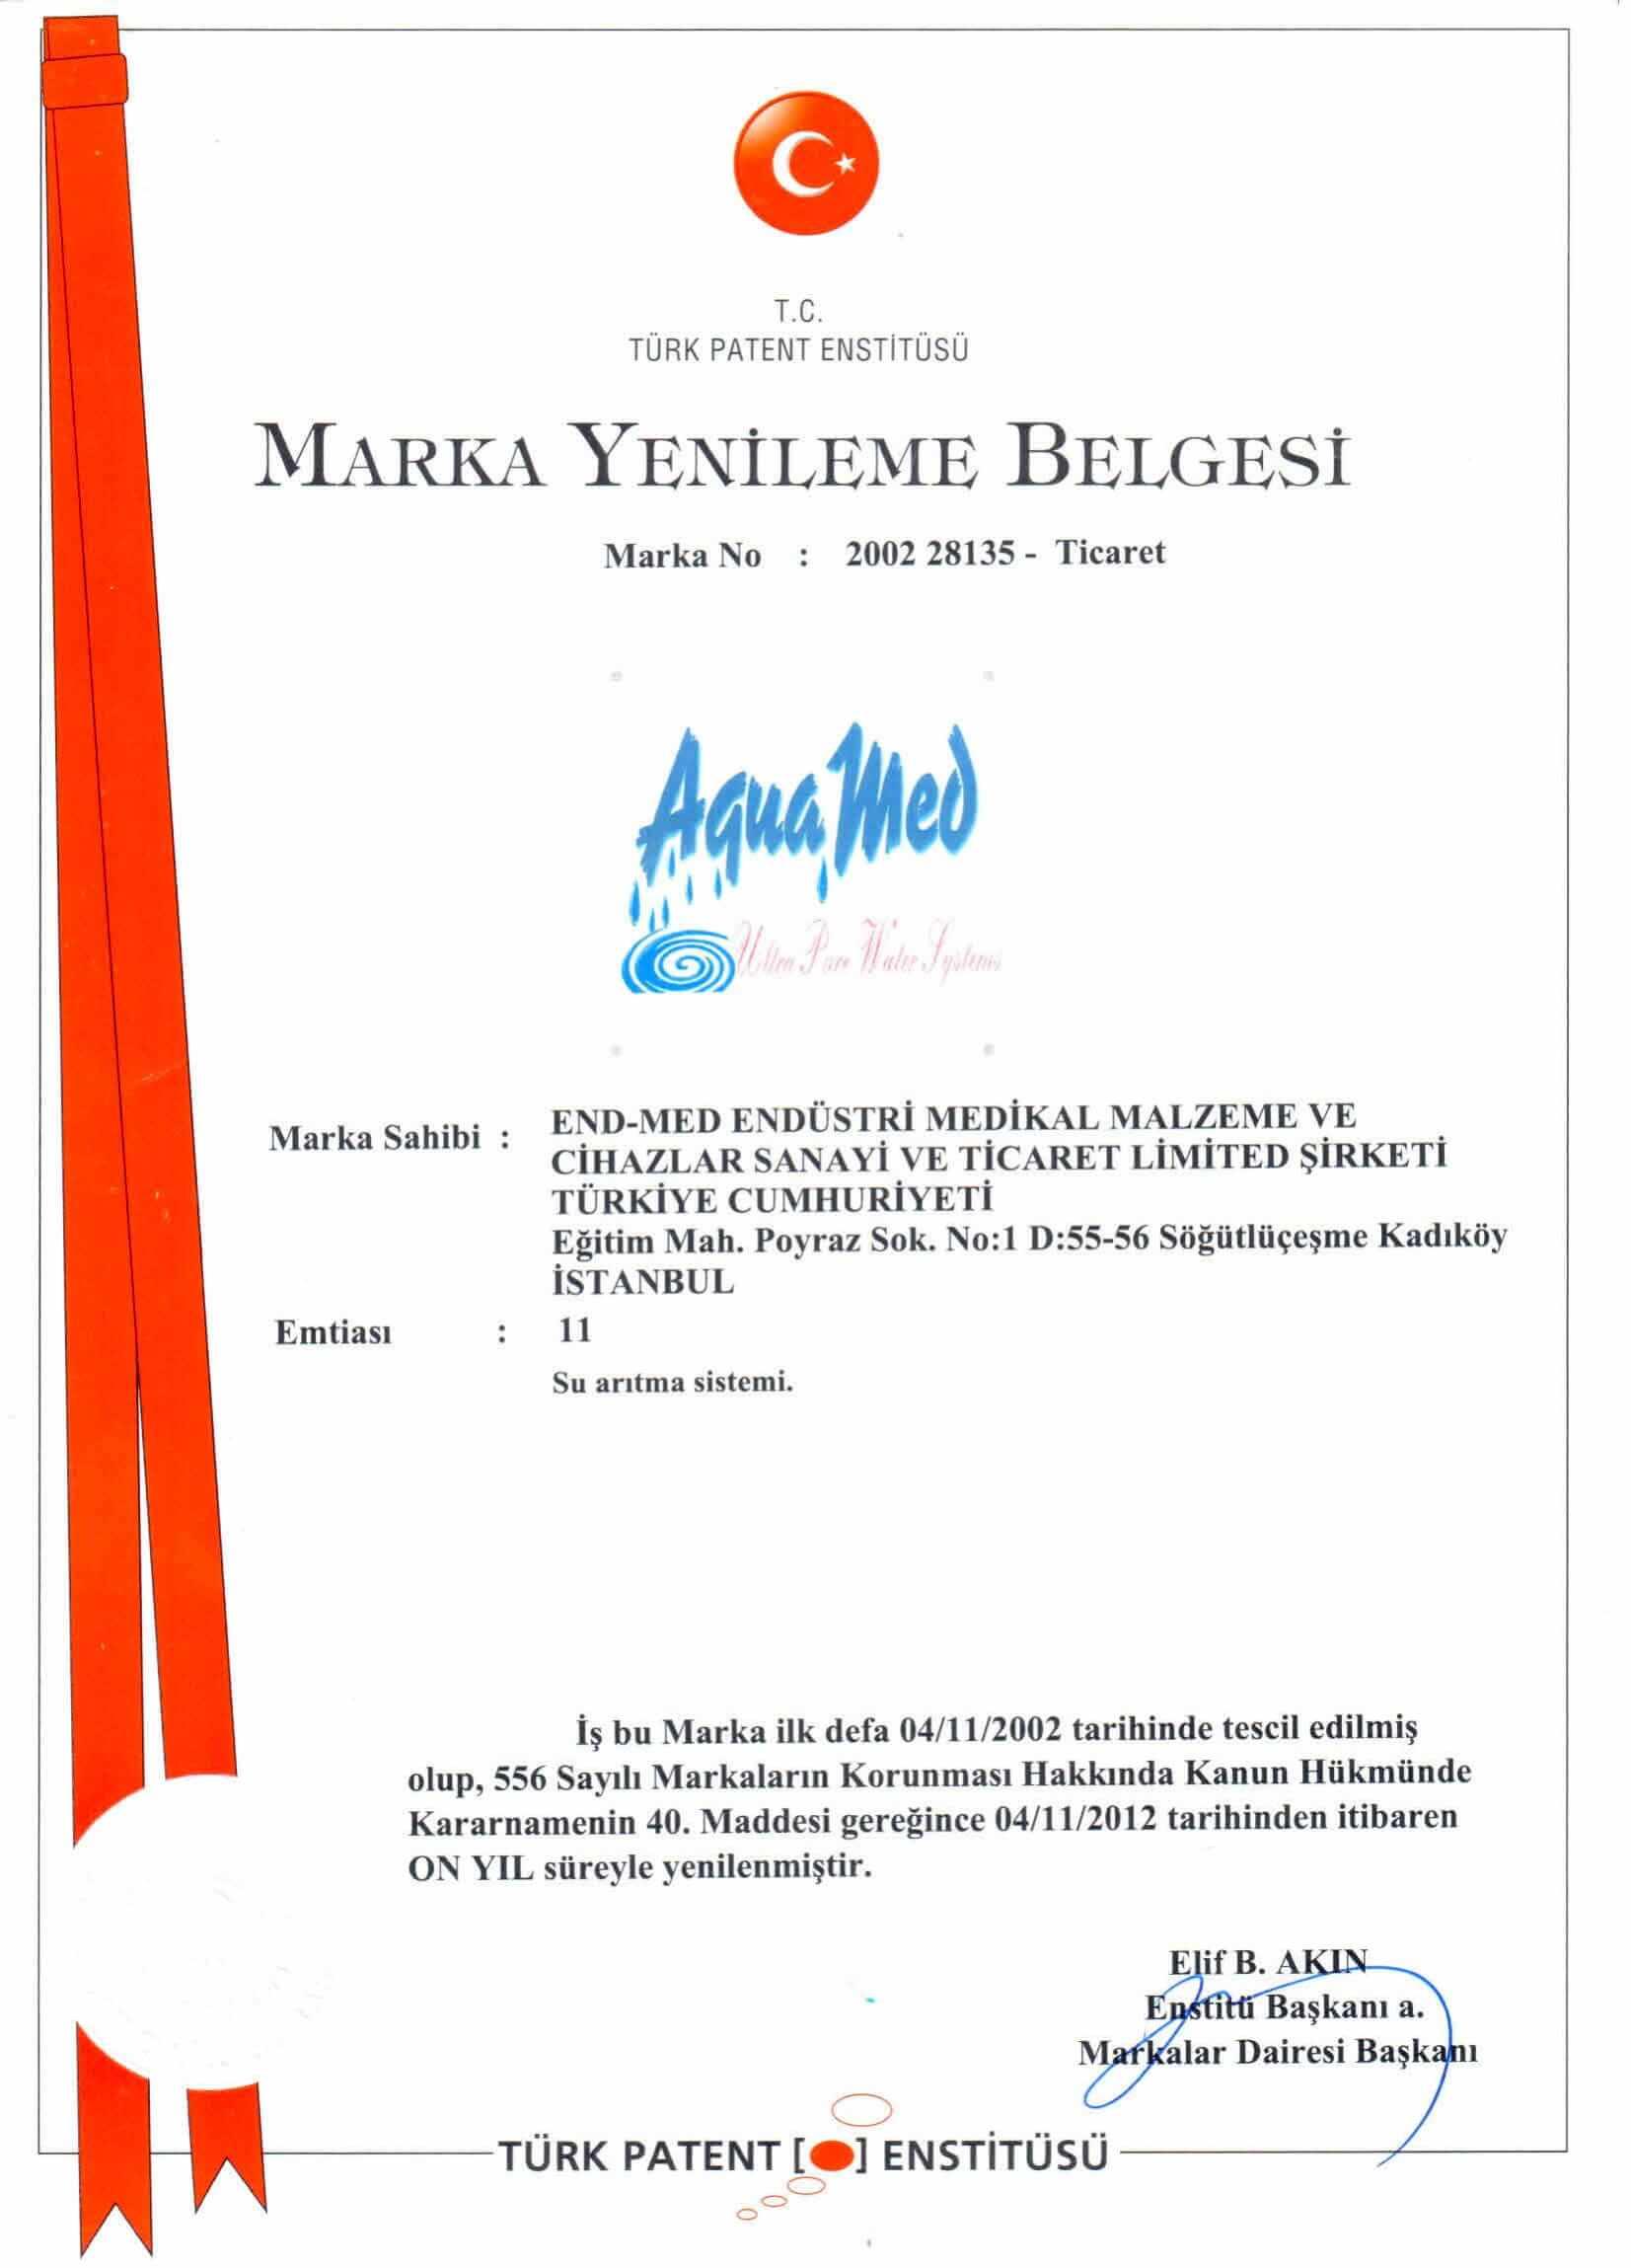 AQUAMED-MARKA-tescil-yeni-1